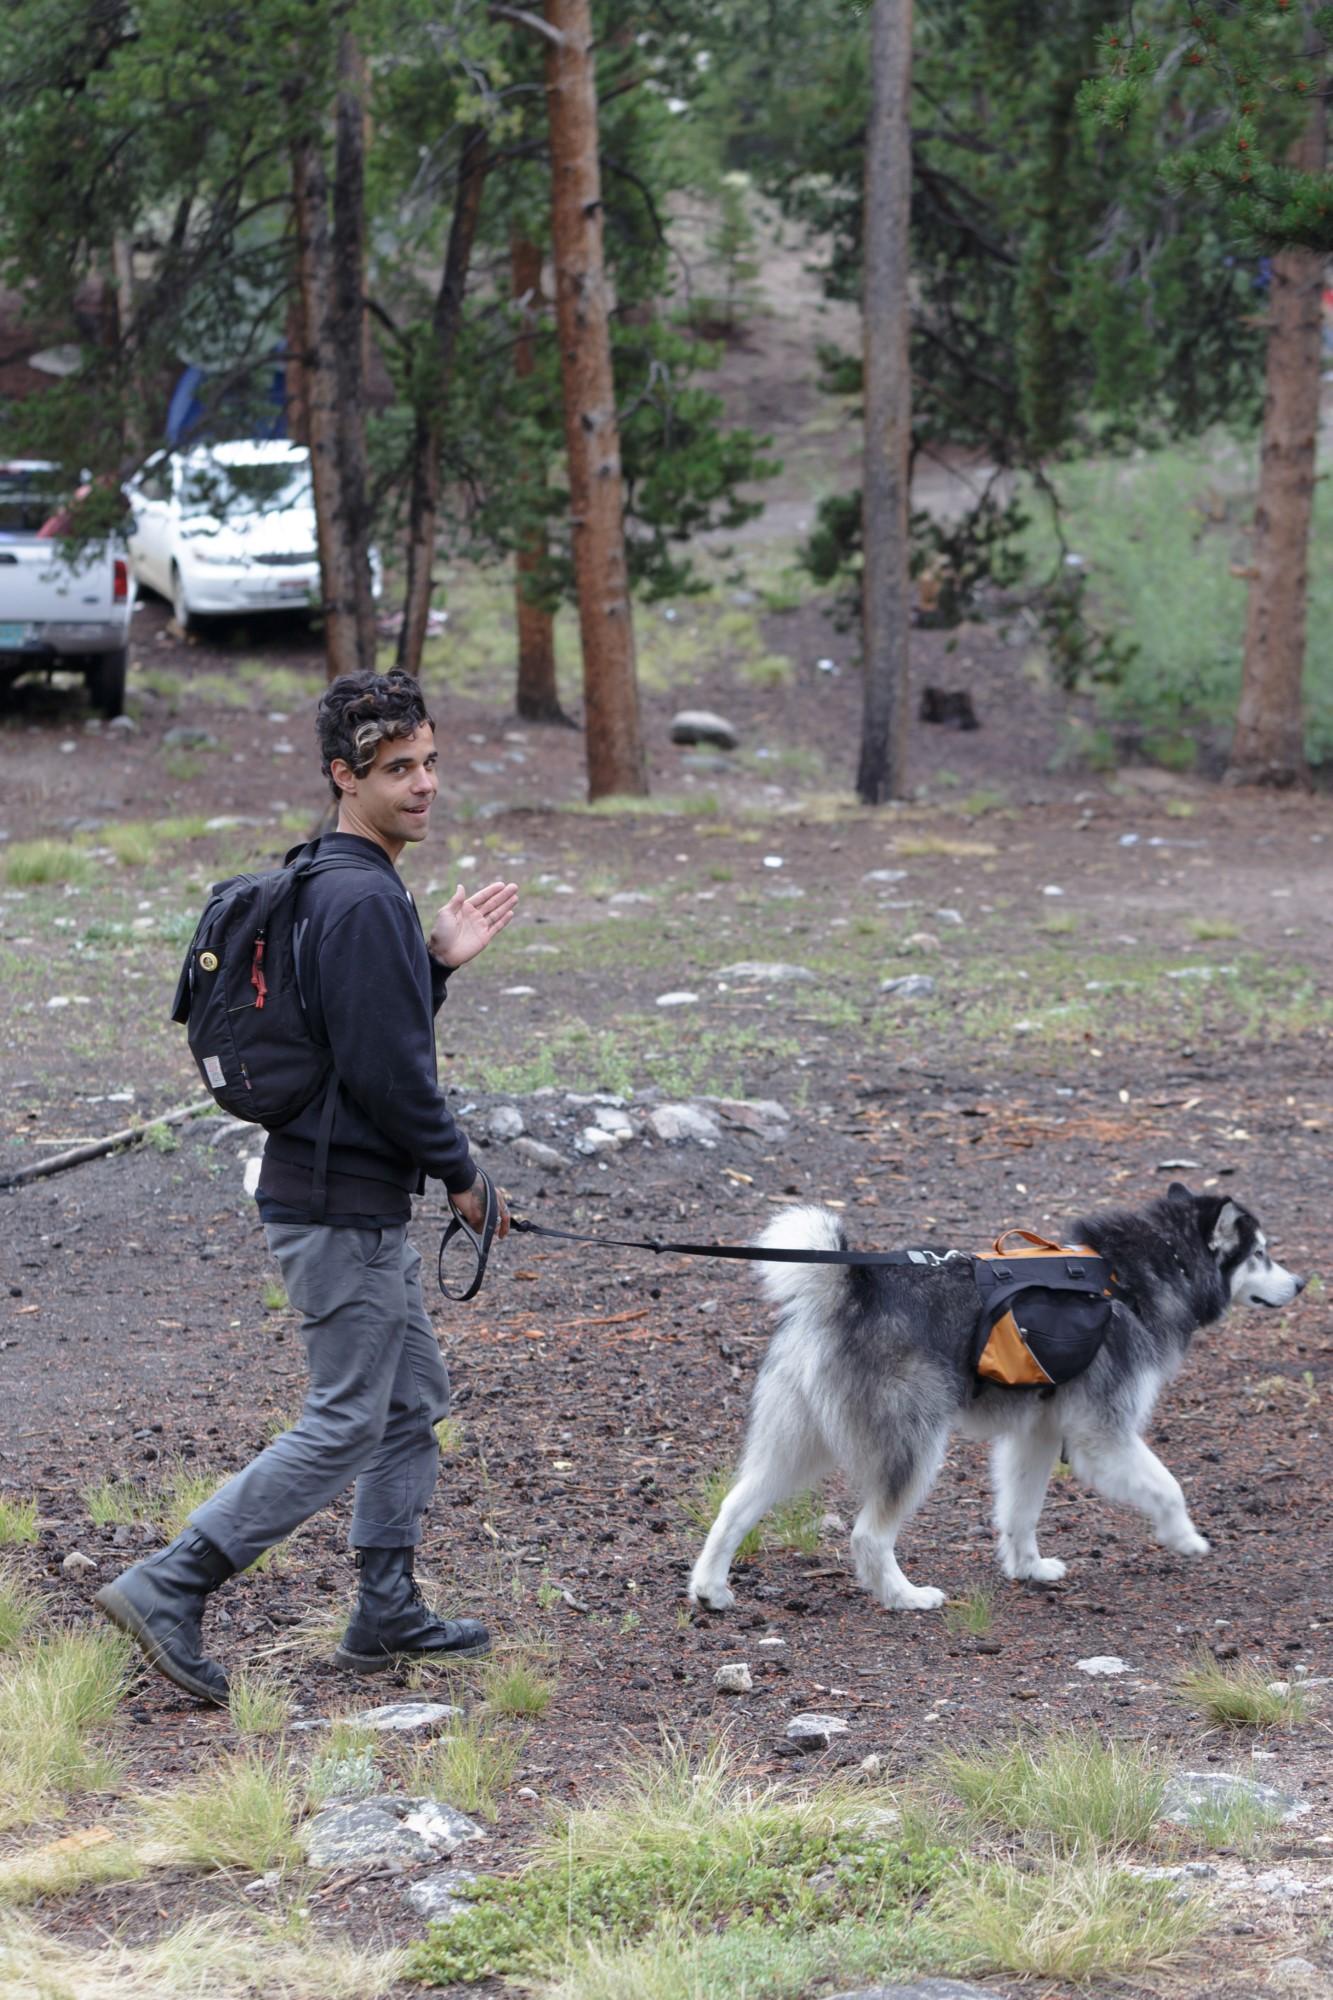 02-Colorado-Road-Trip-2016-Cody-Lampman-Wednesday-Kuhn